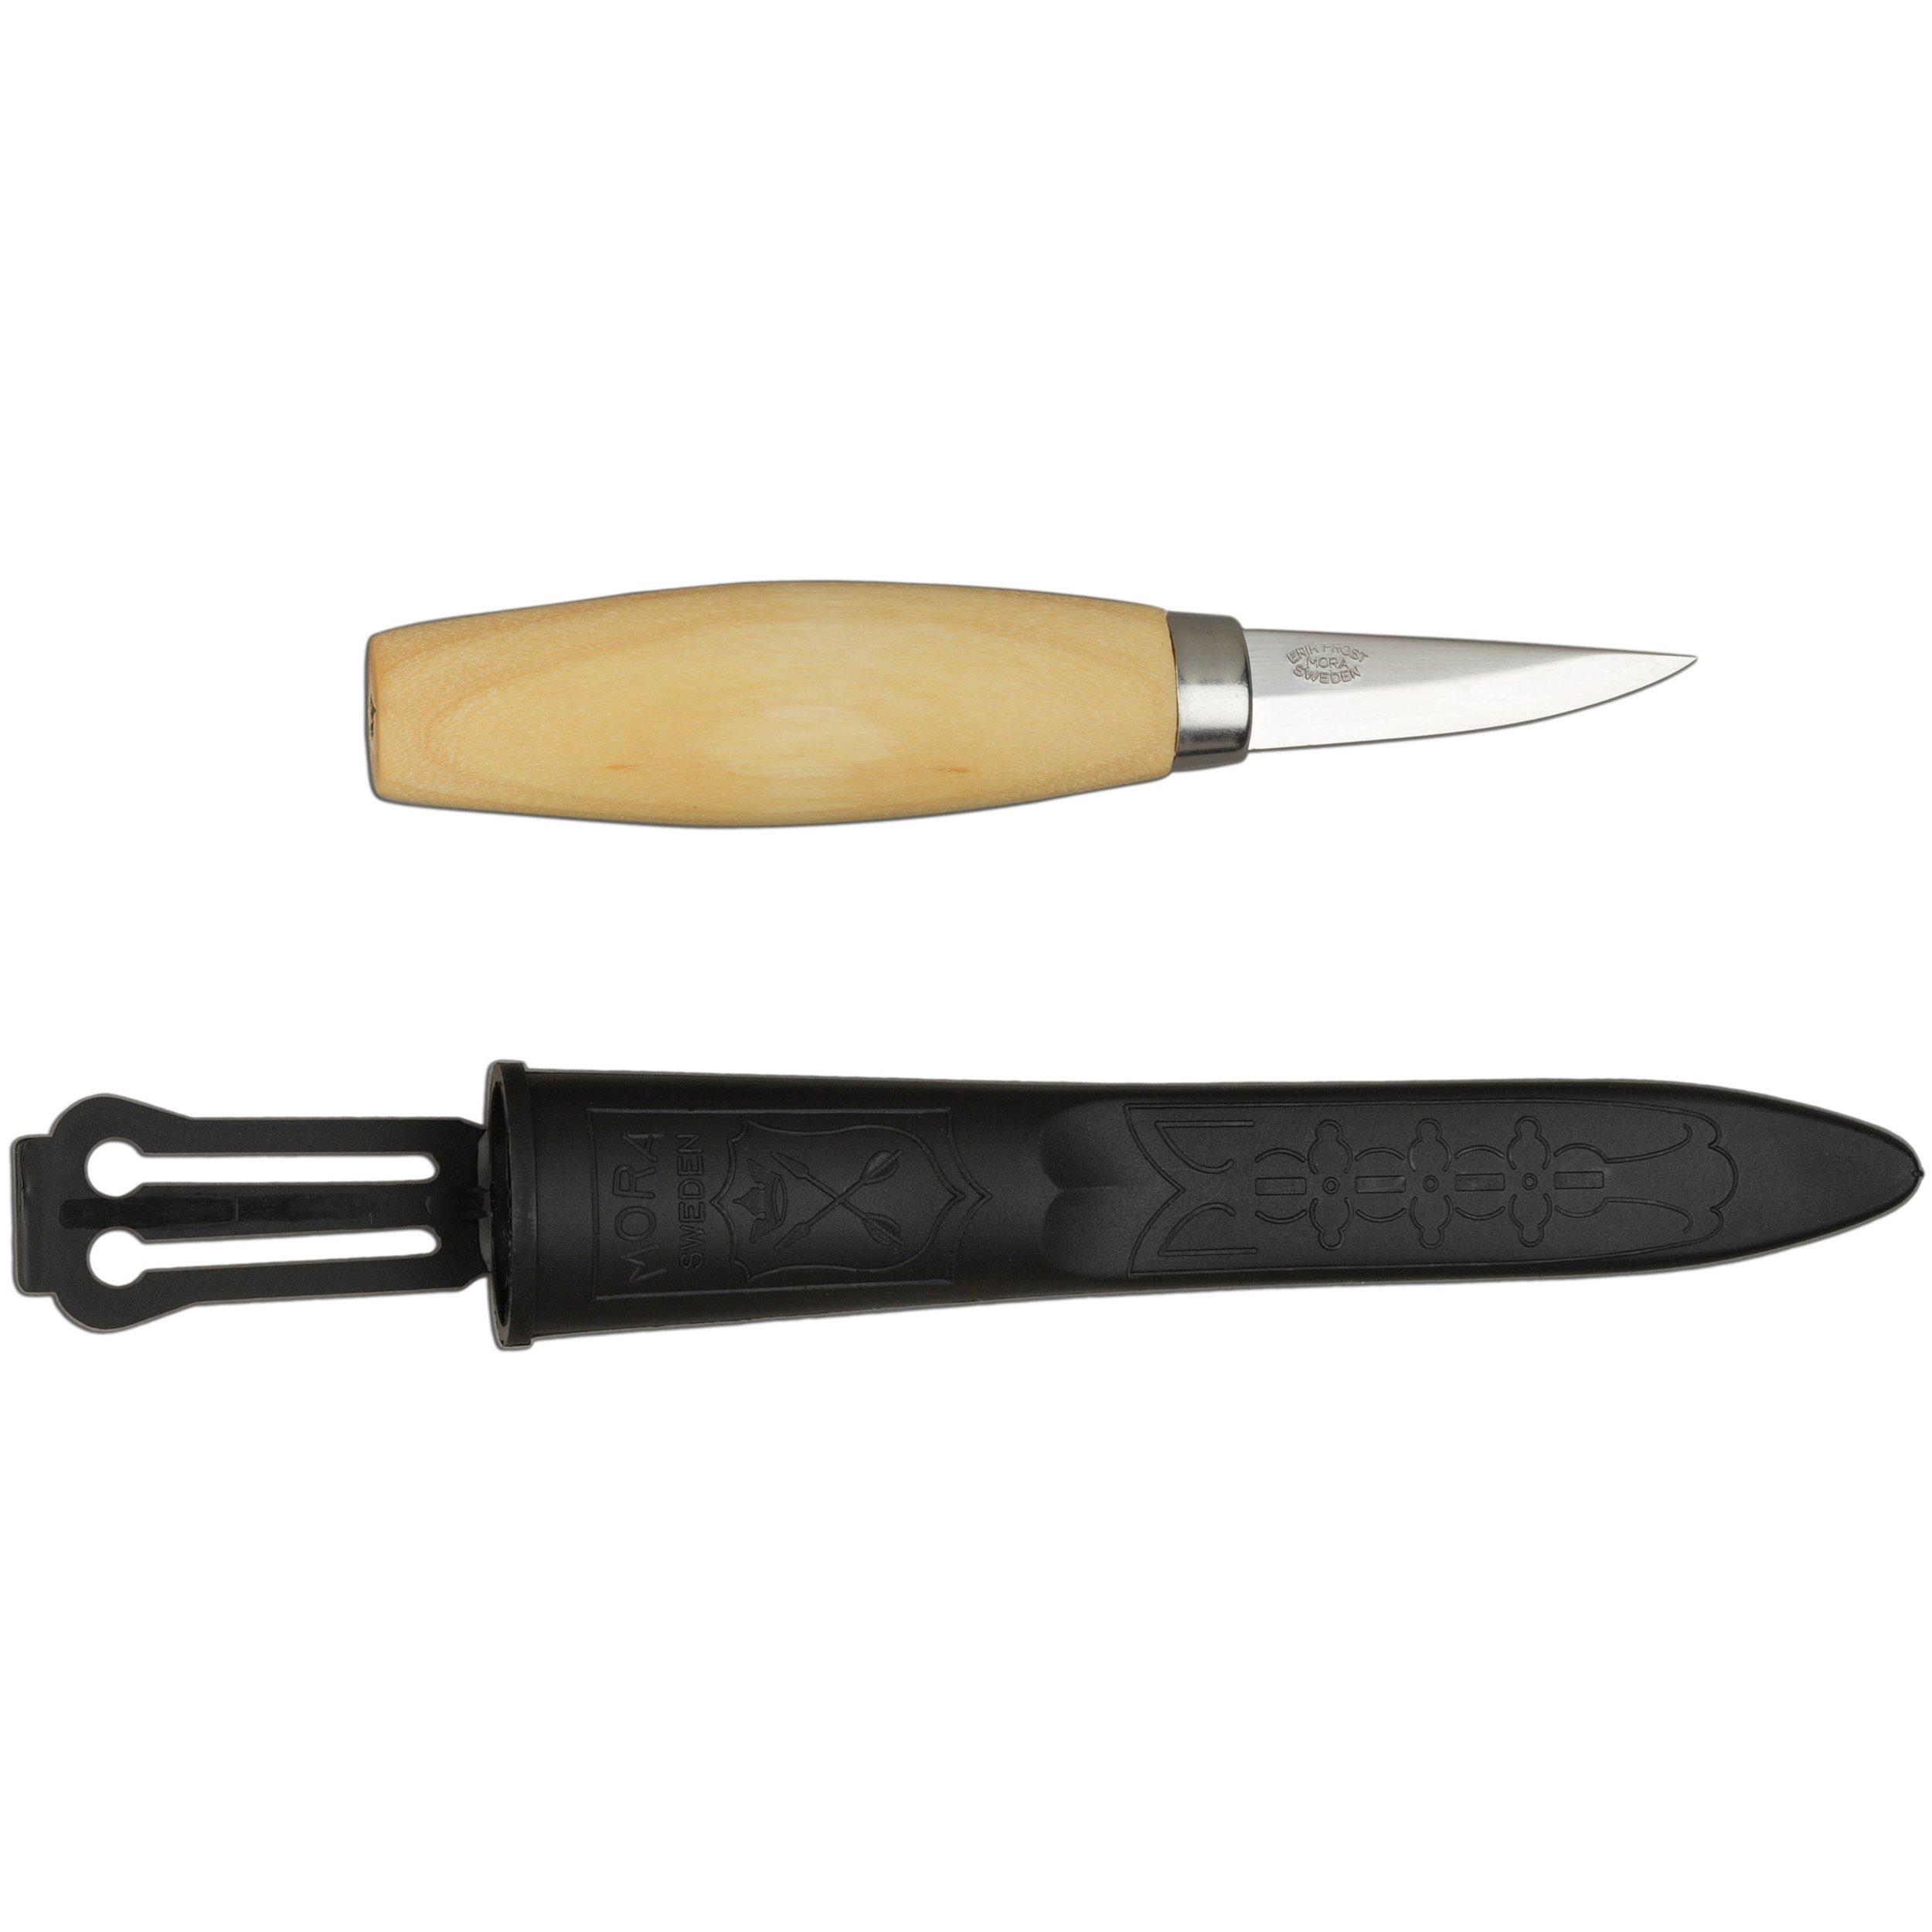 Morakniv Wood Carving 120 Knife with Laminated Steel Blade, 2.4-Inch by Morakniv